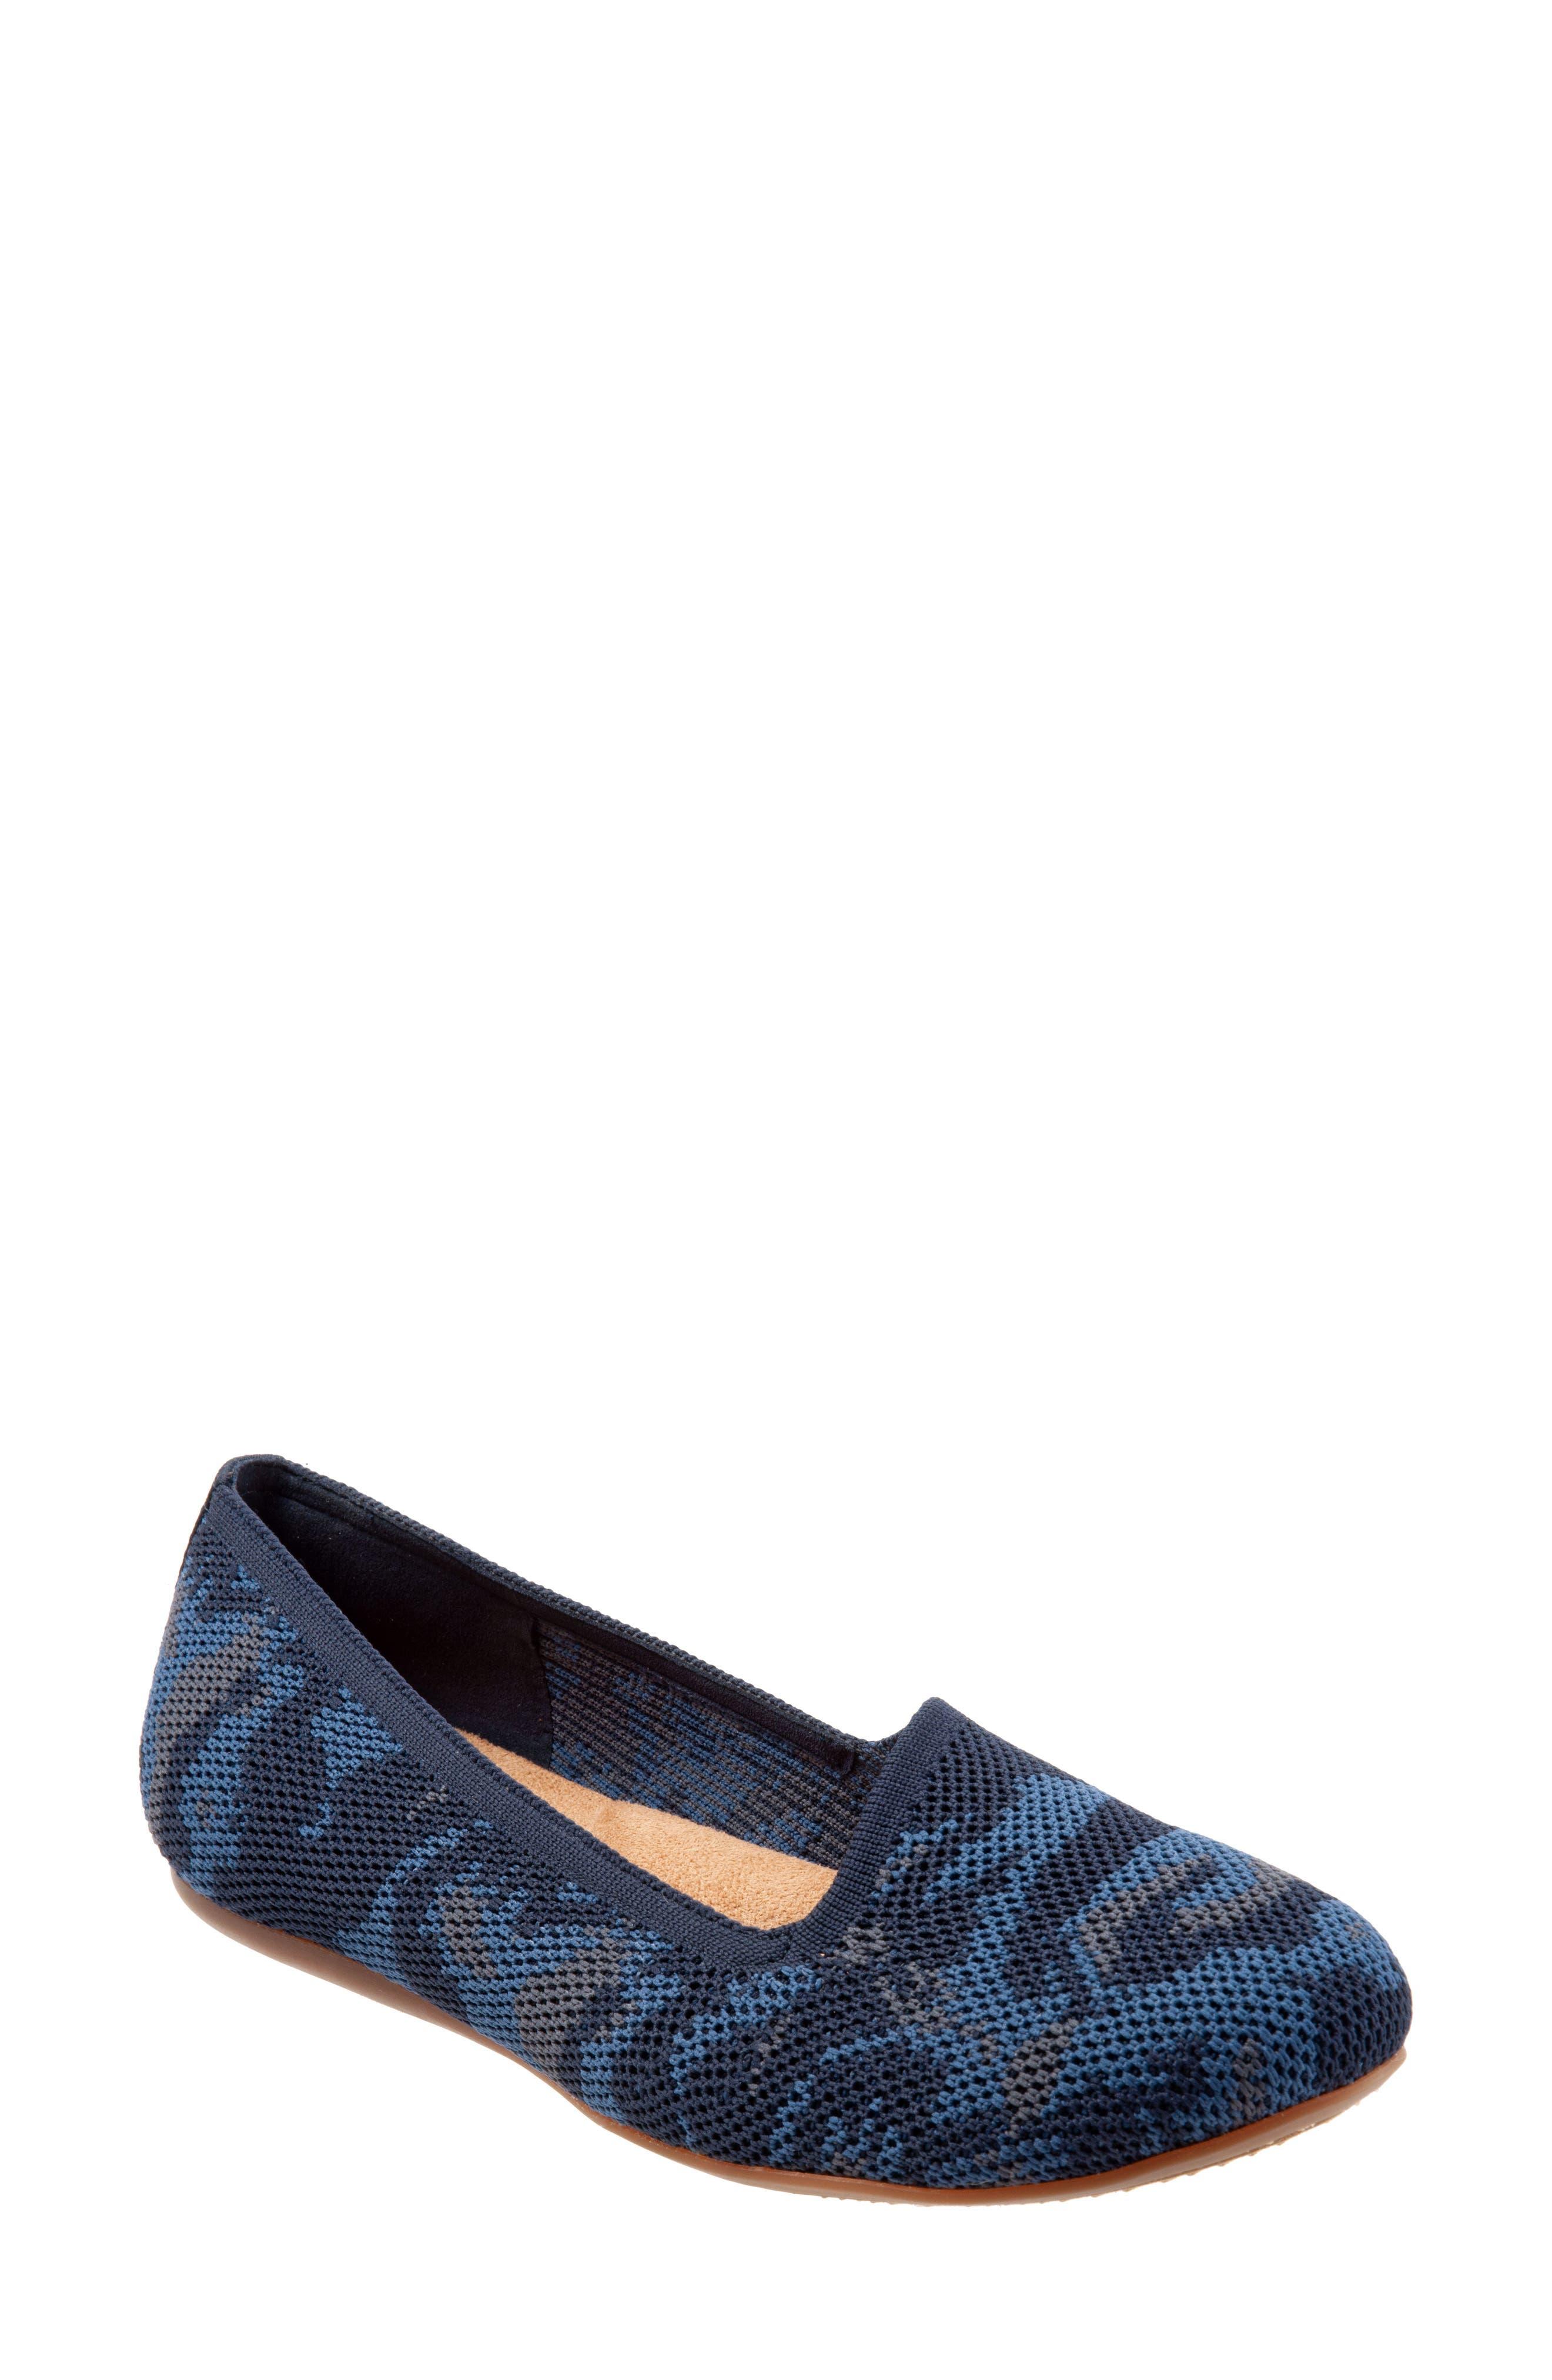 Softwalk Sicily Knit Flat WW - Blue